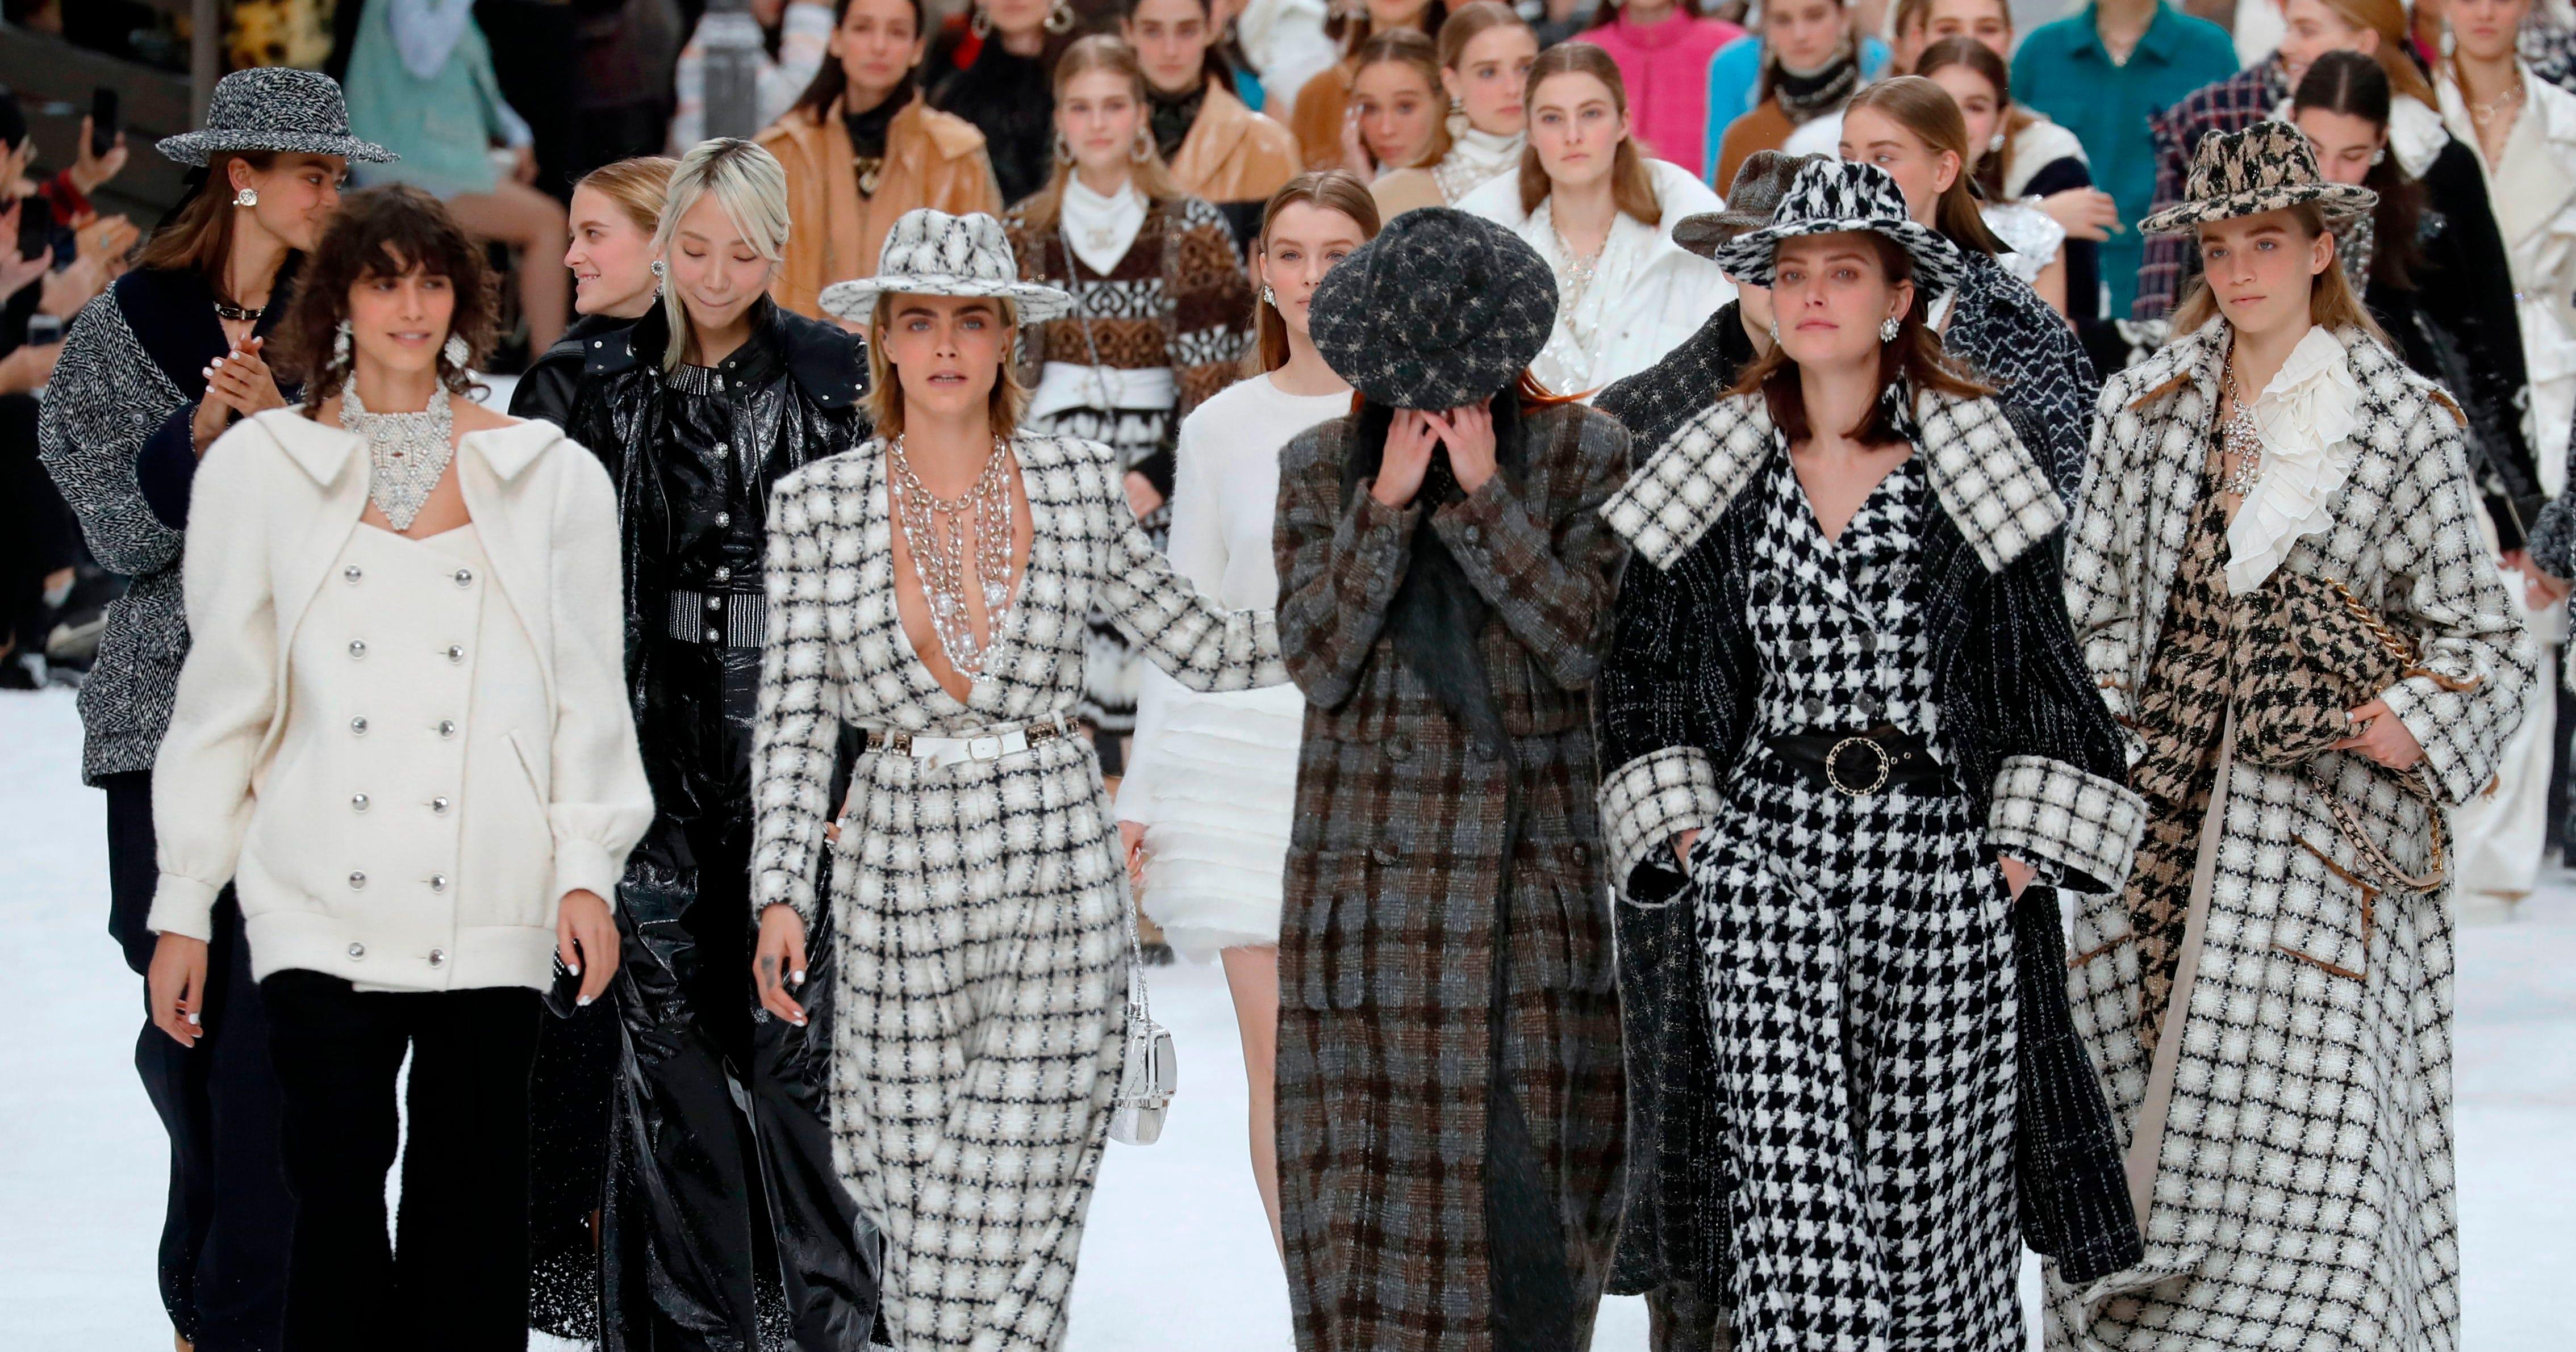 075d6dc74246 Karl Lagerfeld's Last Paris Fashion Show - Fall 2019